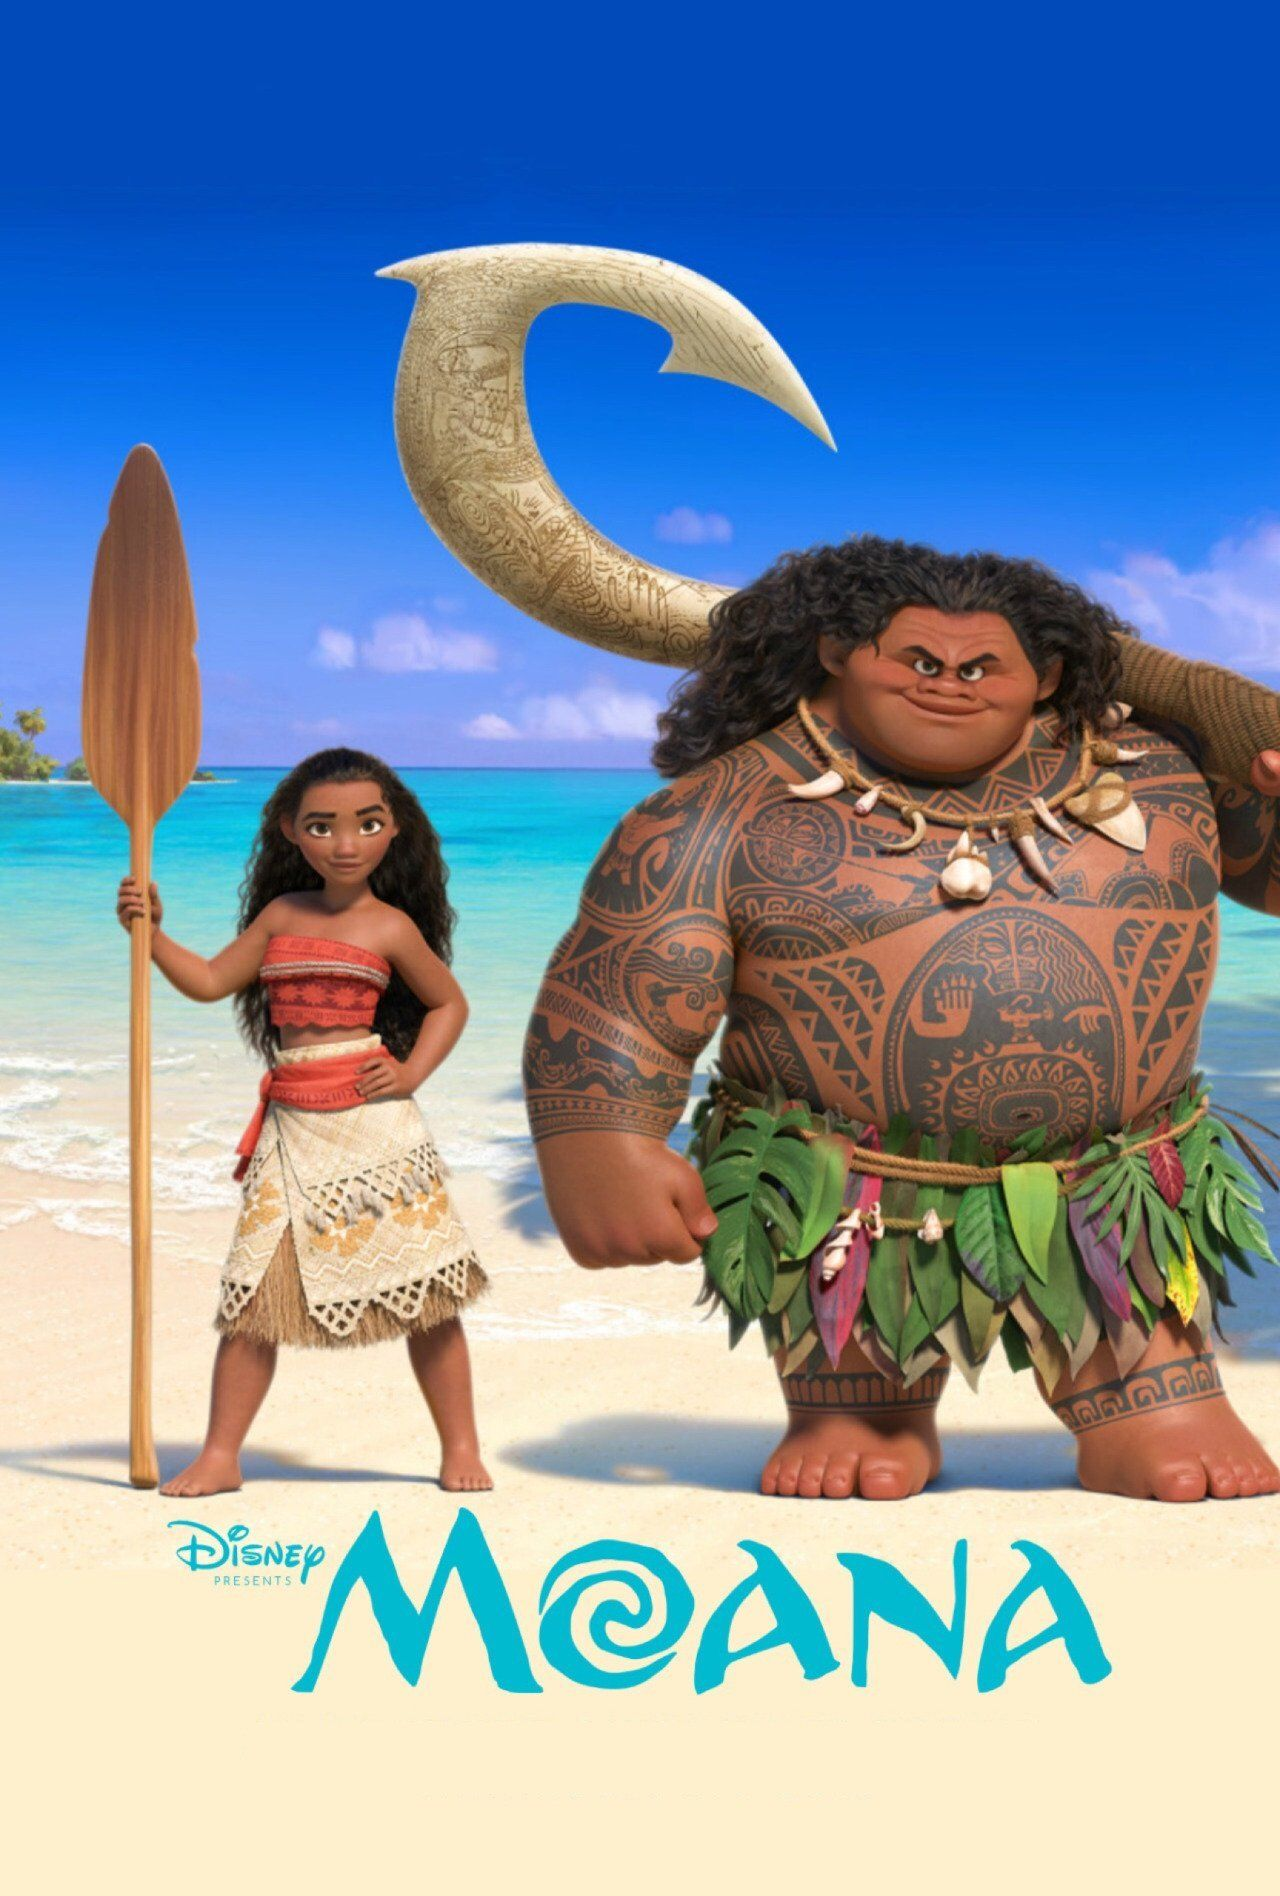 moana full movie 2016 online watch free